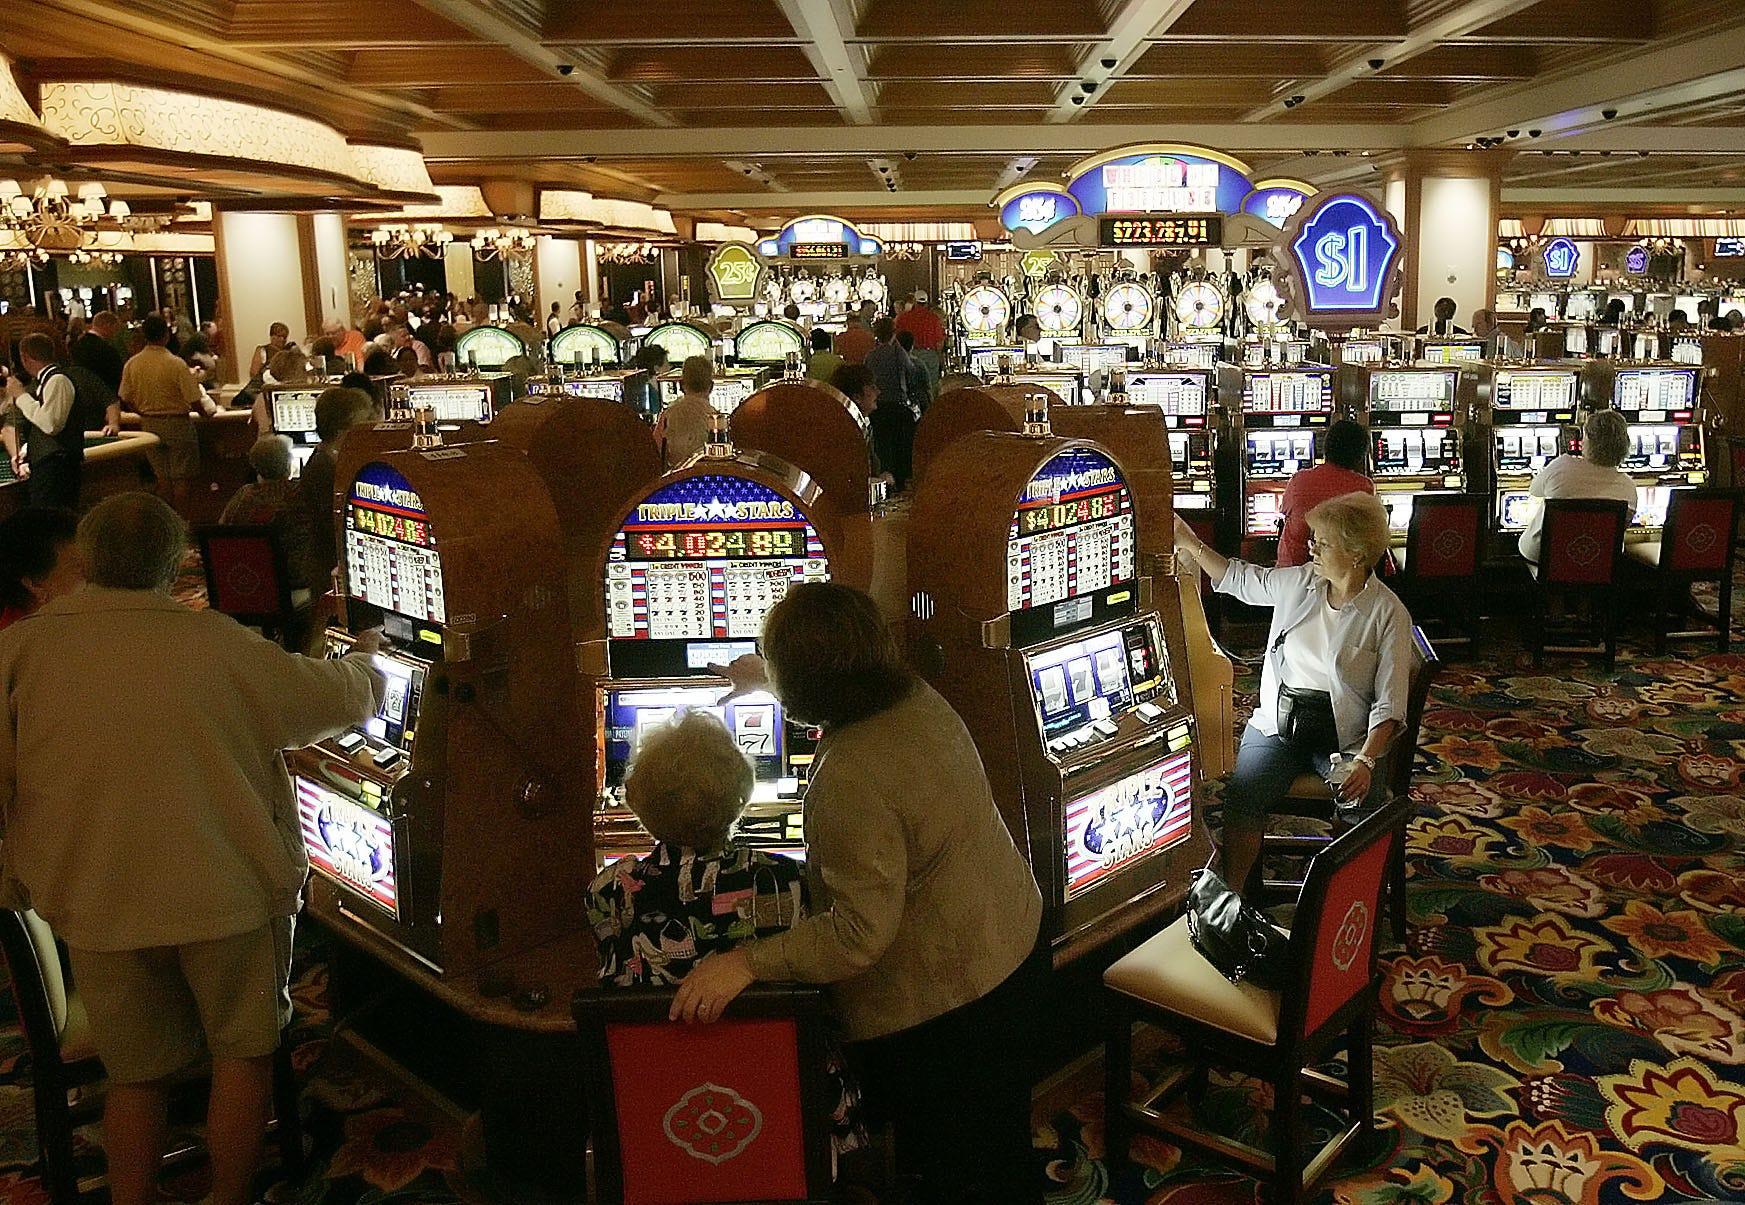 Susan kirk casino manager maui gambling bust